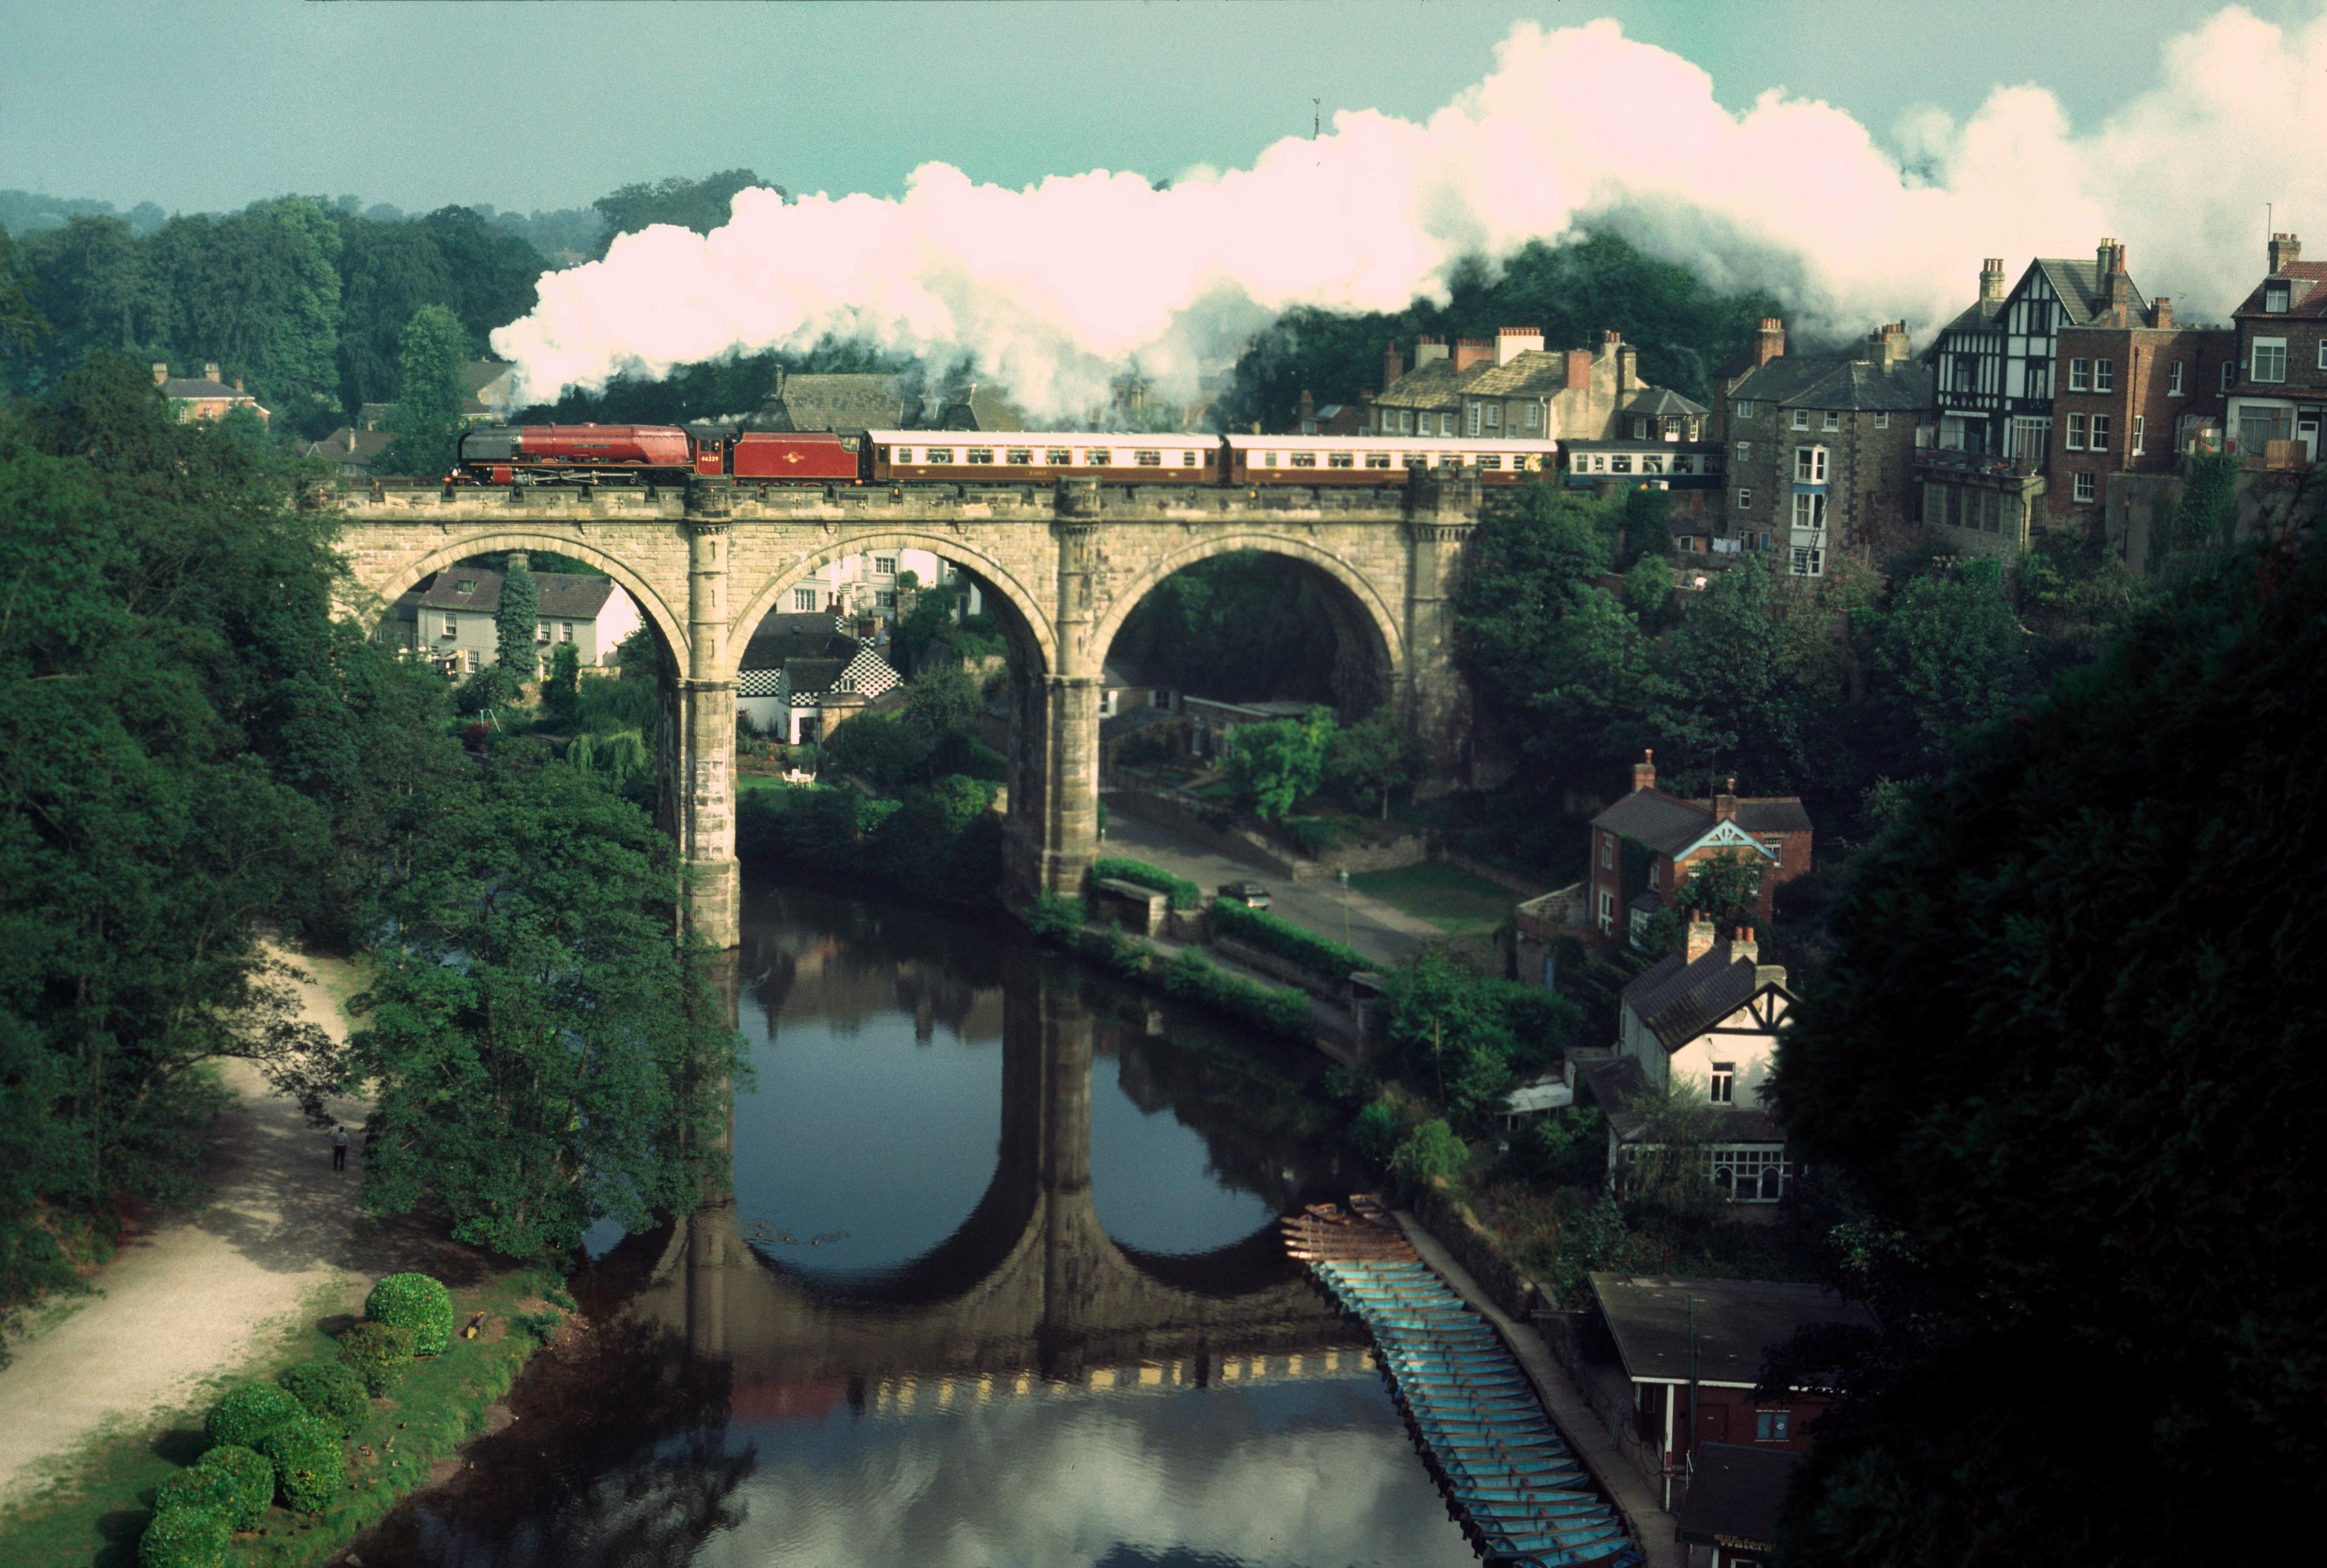 46229 Duchess of Hamilton Crossing River Nidd at Knaresborough 12/8/84